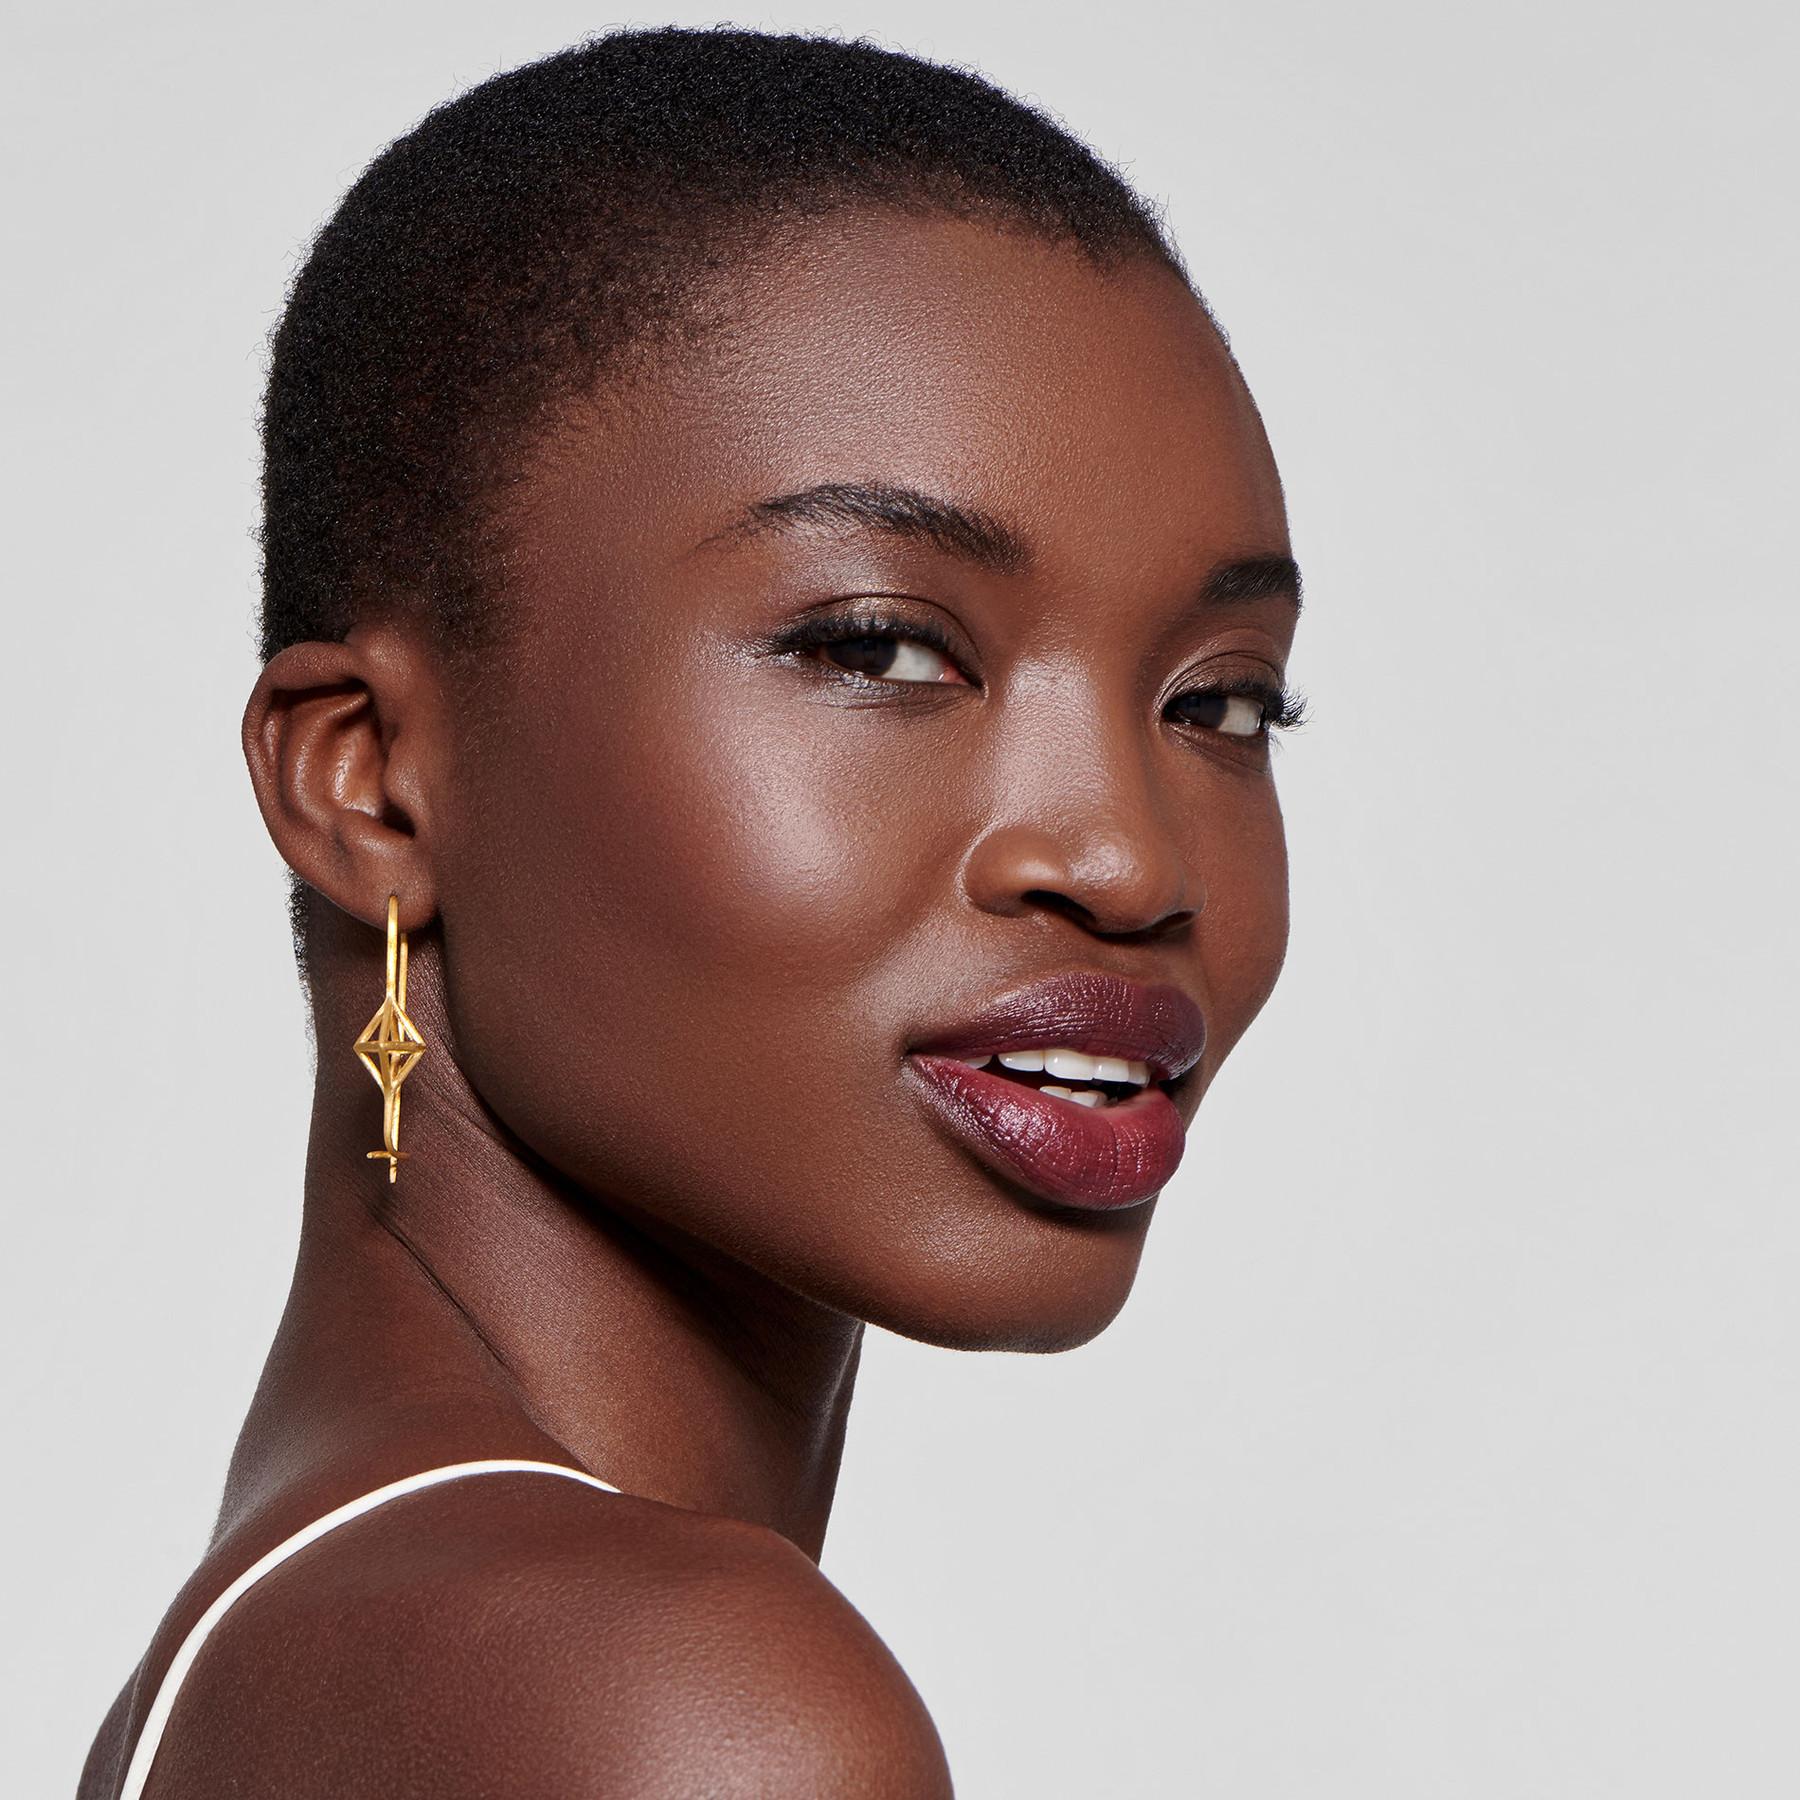 lovely black model gazing to the side wearing cage hook earrings in 22 karat satin gold